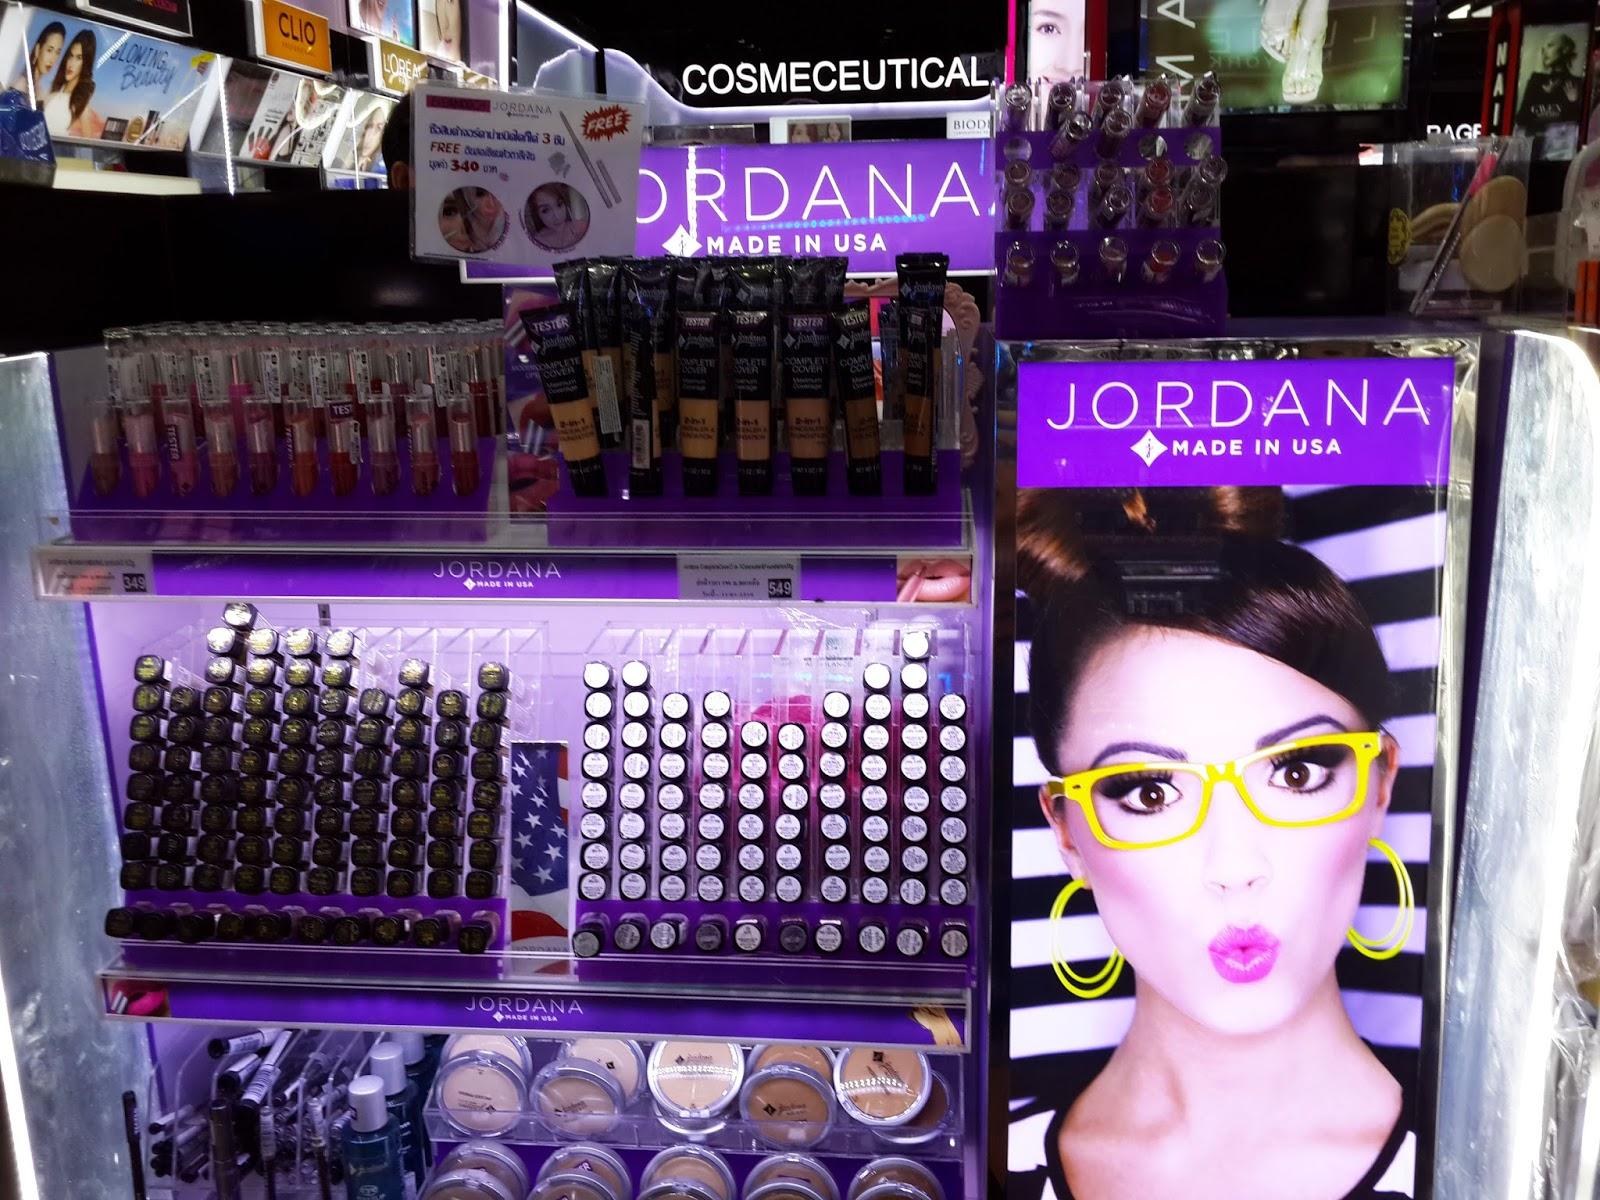 jordana bangkok drugstore makeup